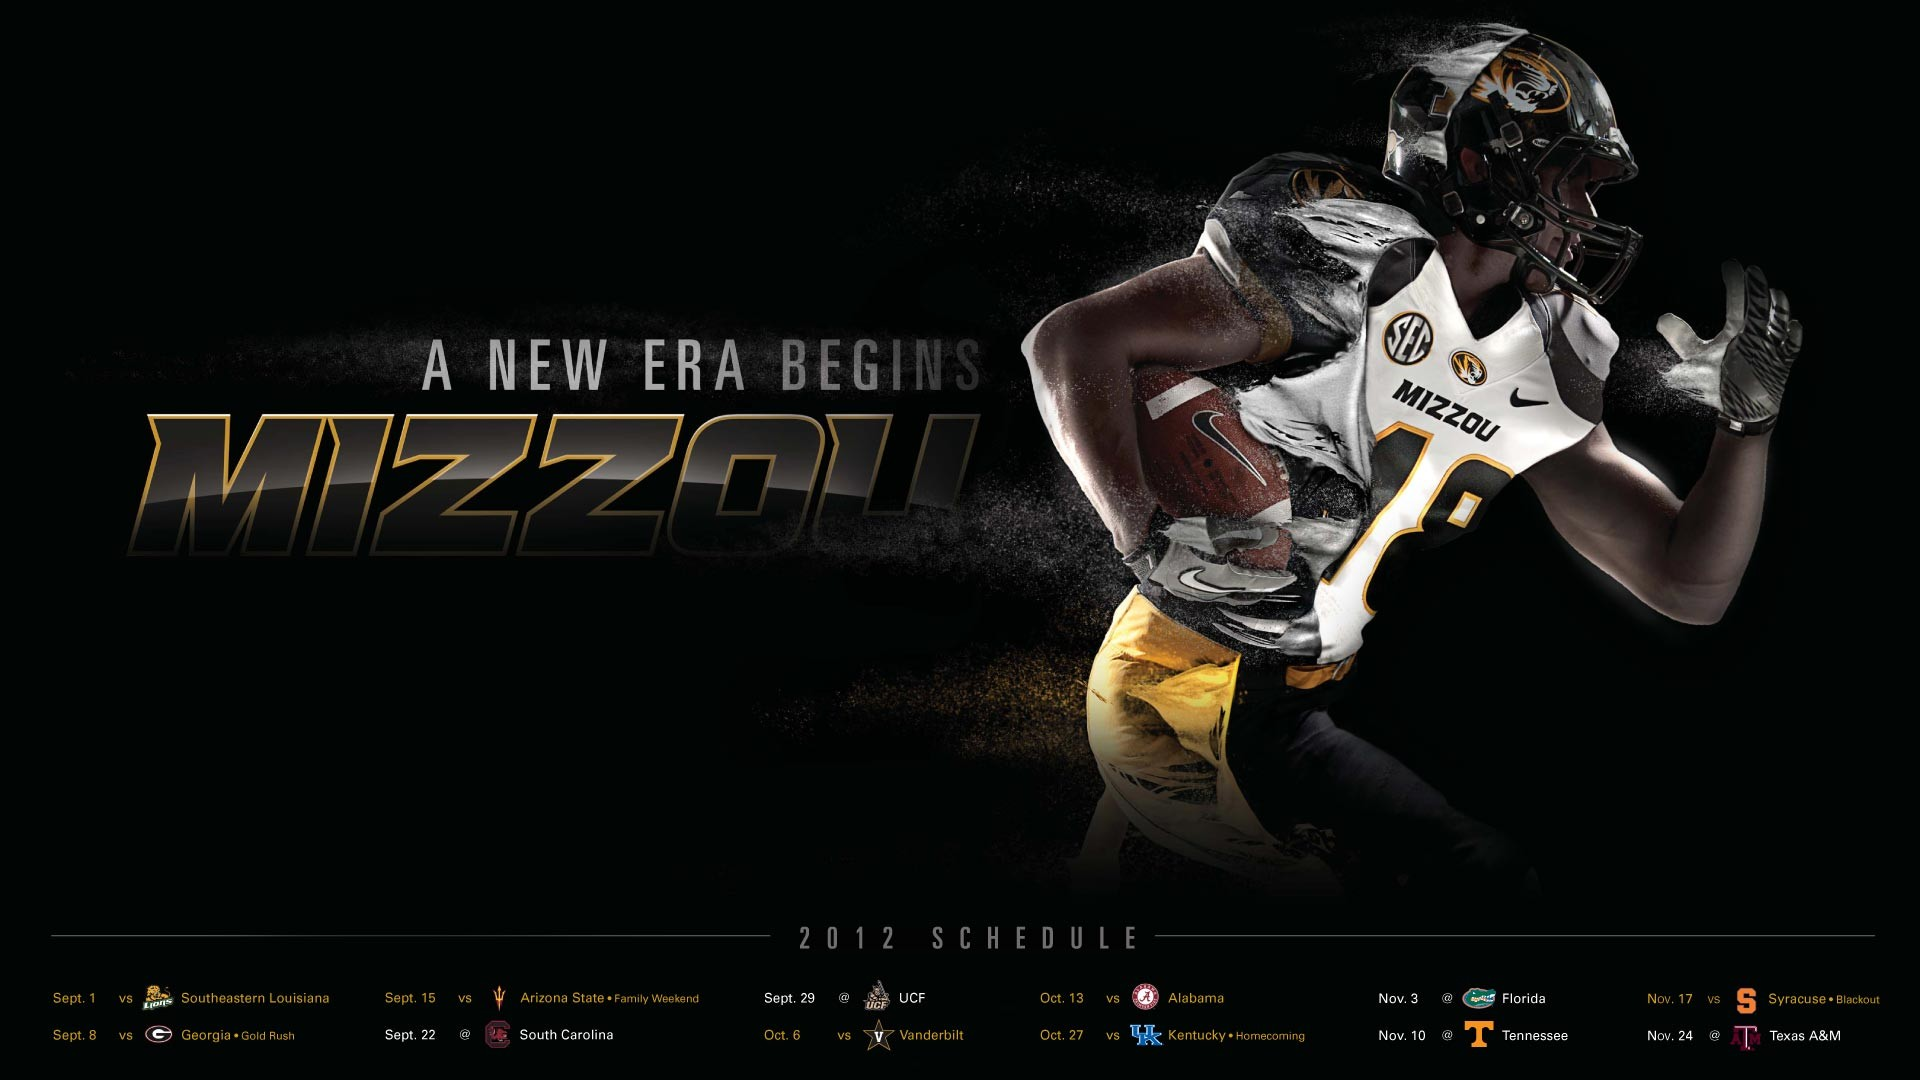 FunMozar – American Football Wallpapers – Part 2